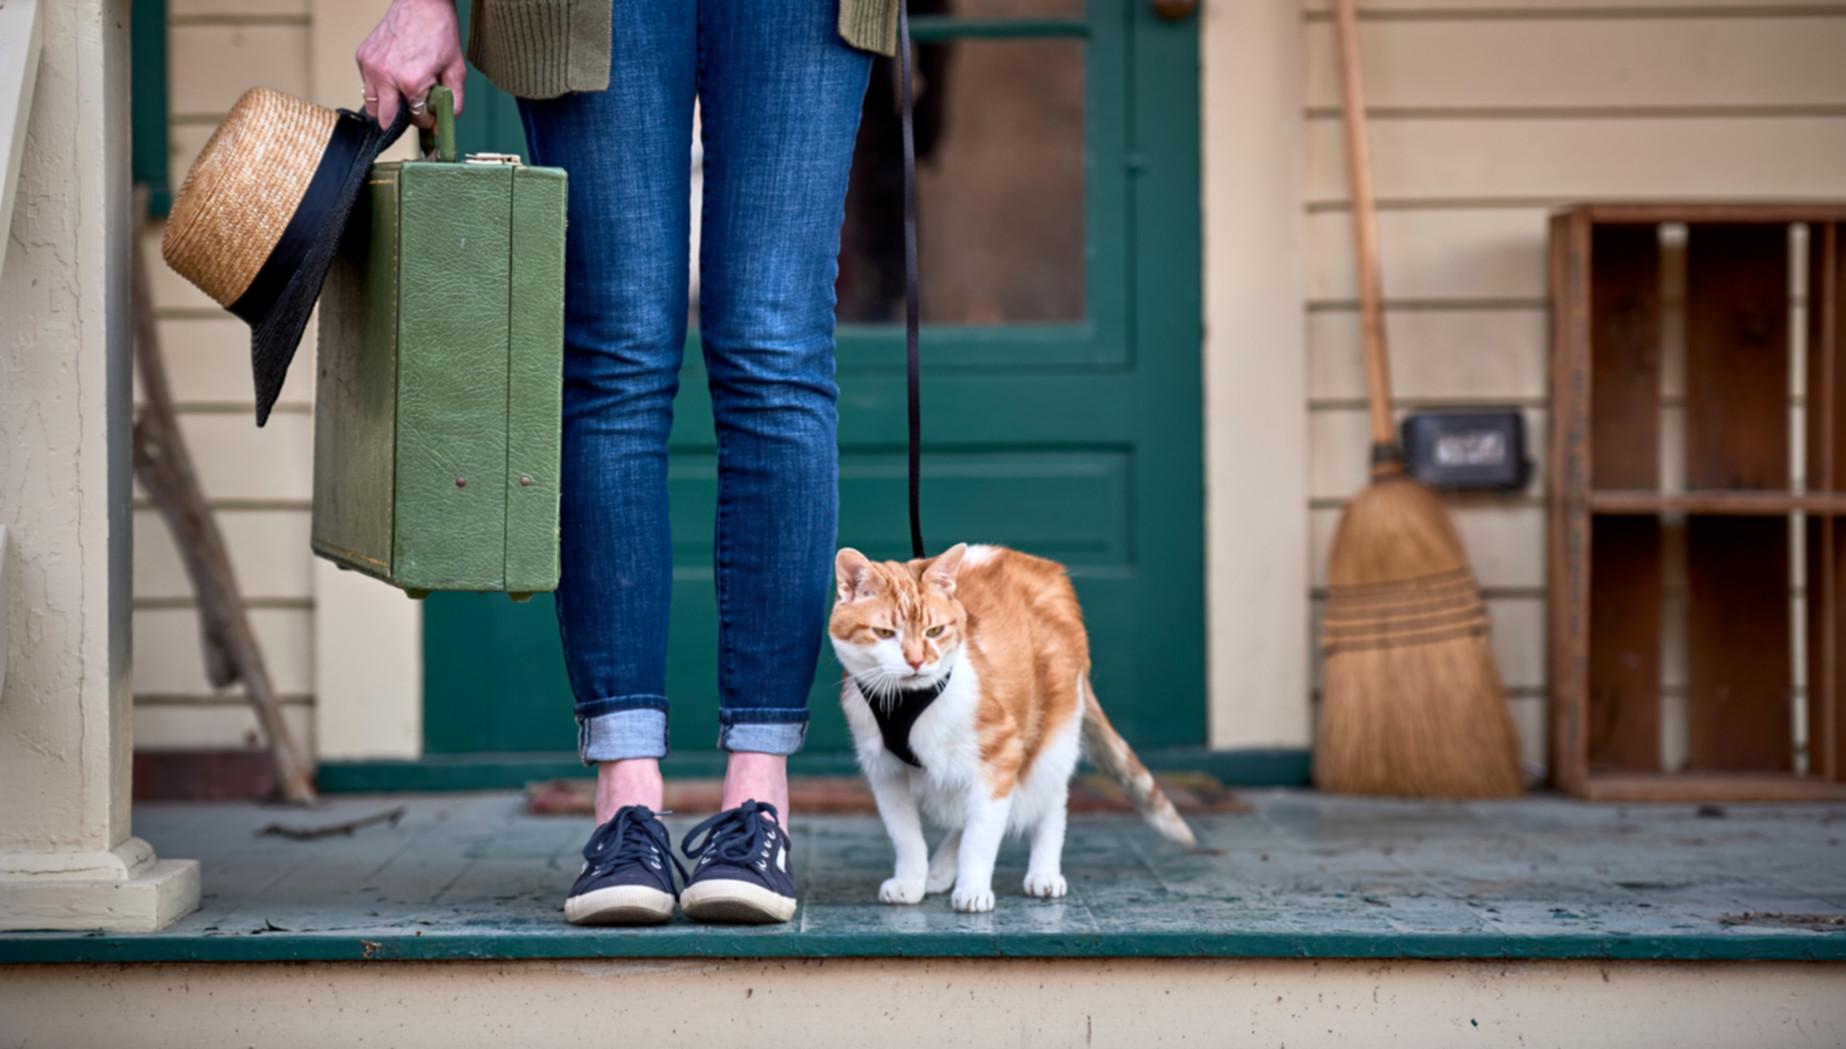 Frau mit Katze vor dem Umzug